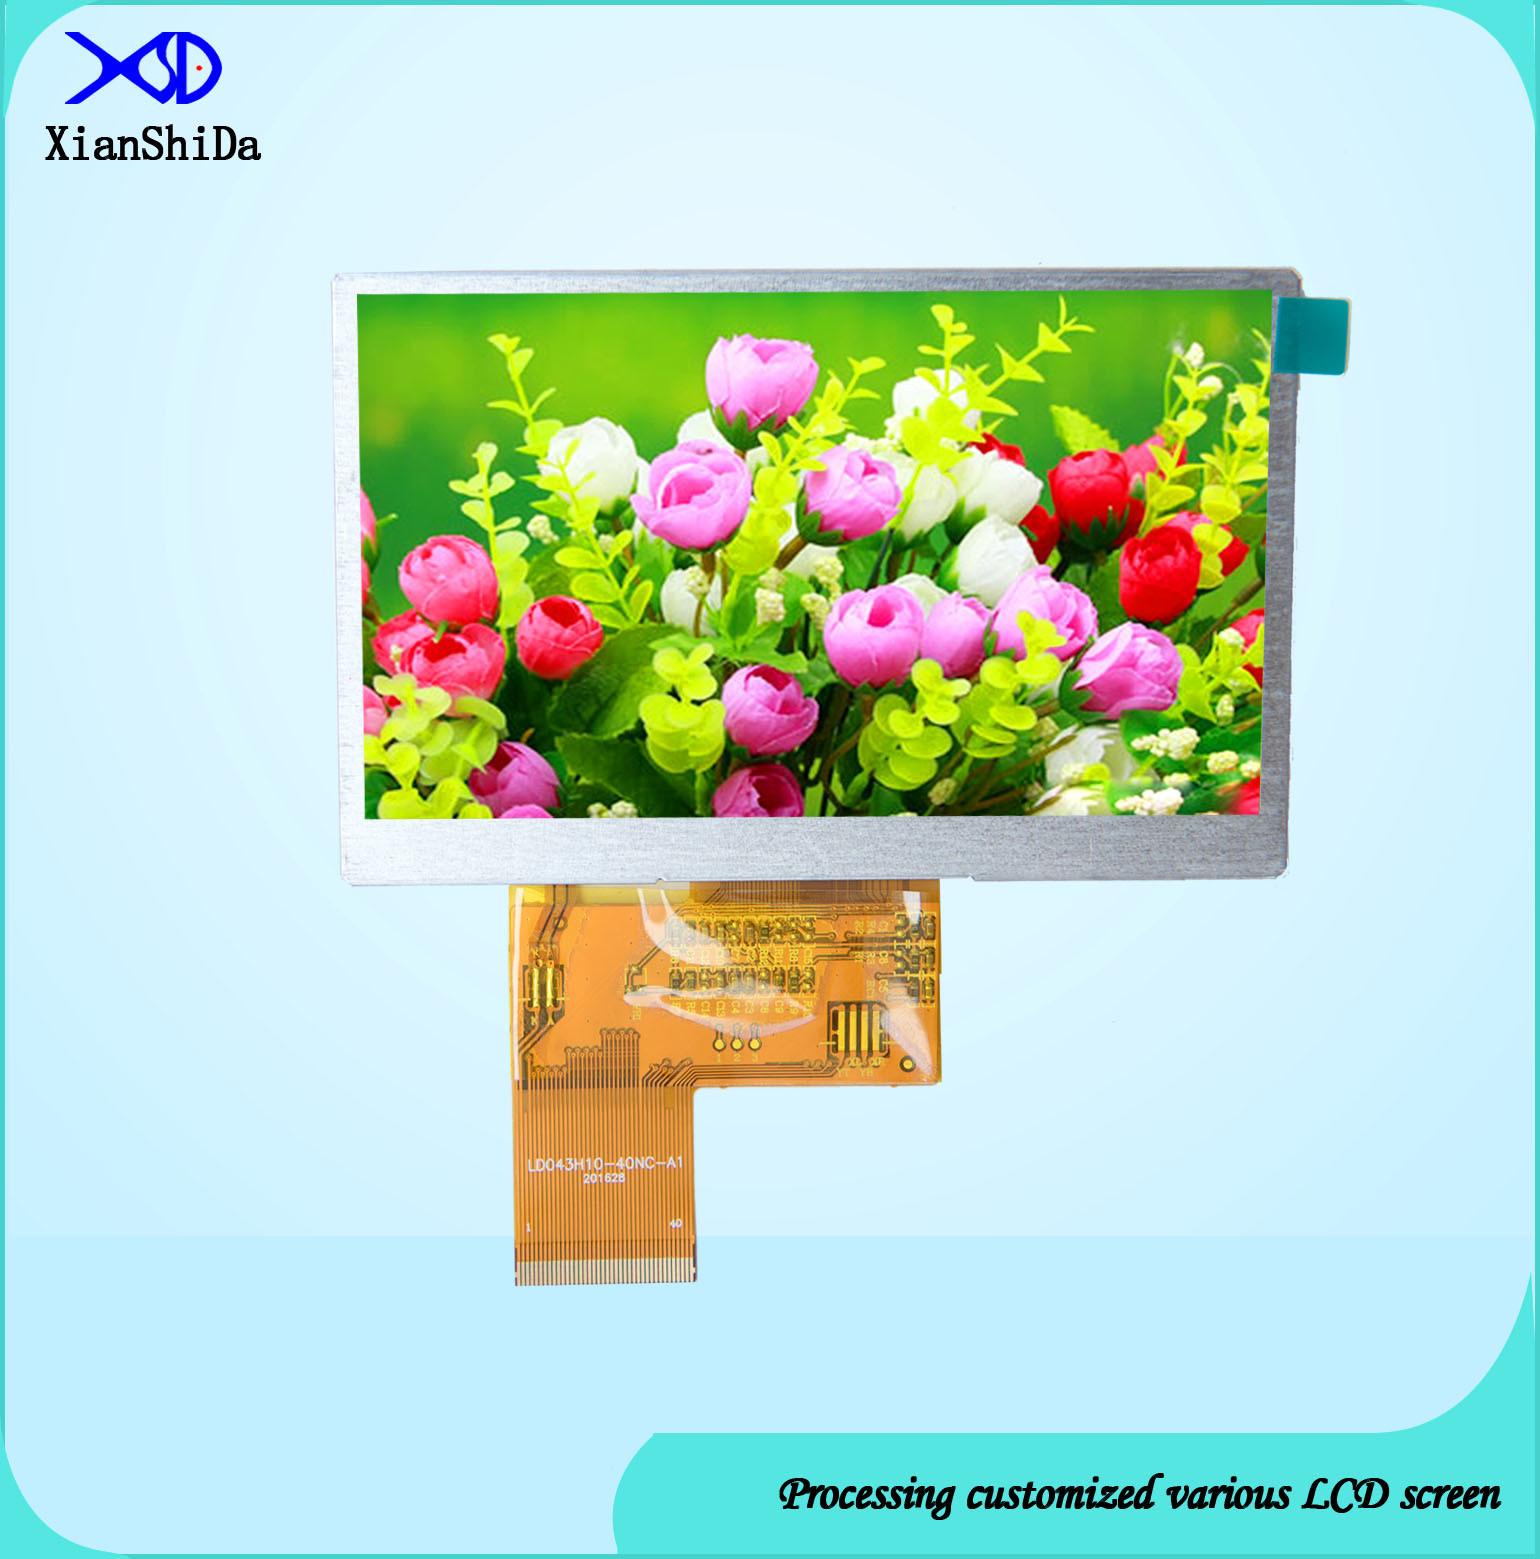 1000CD/M&Sup2 High Brightness 4.3 Inch TFT LCD Screen 480 (RGB) X272 Resolution